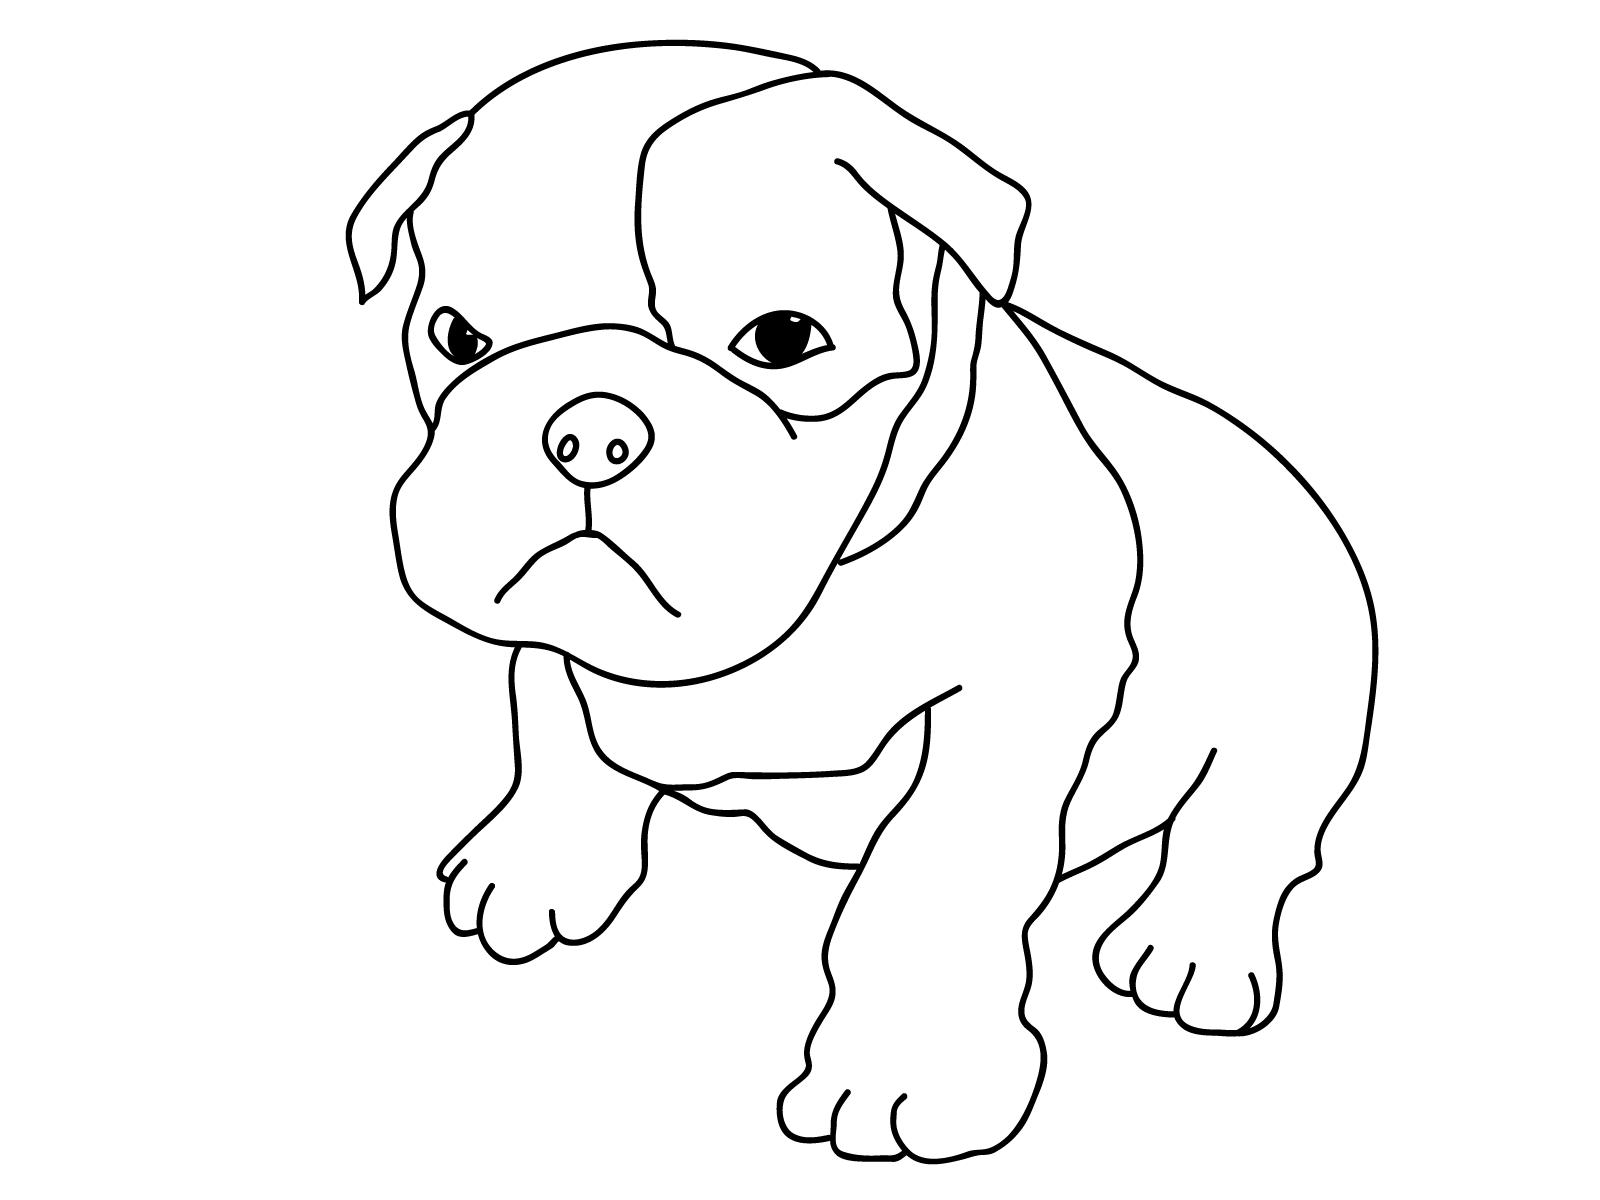 coloring page of dog free printable dog coloring pages dog coloring pages coloring dog of page